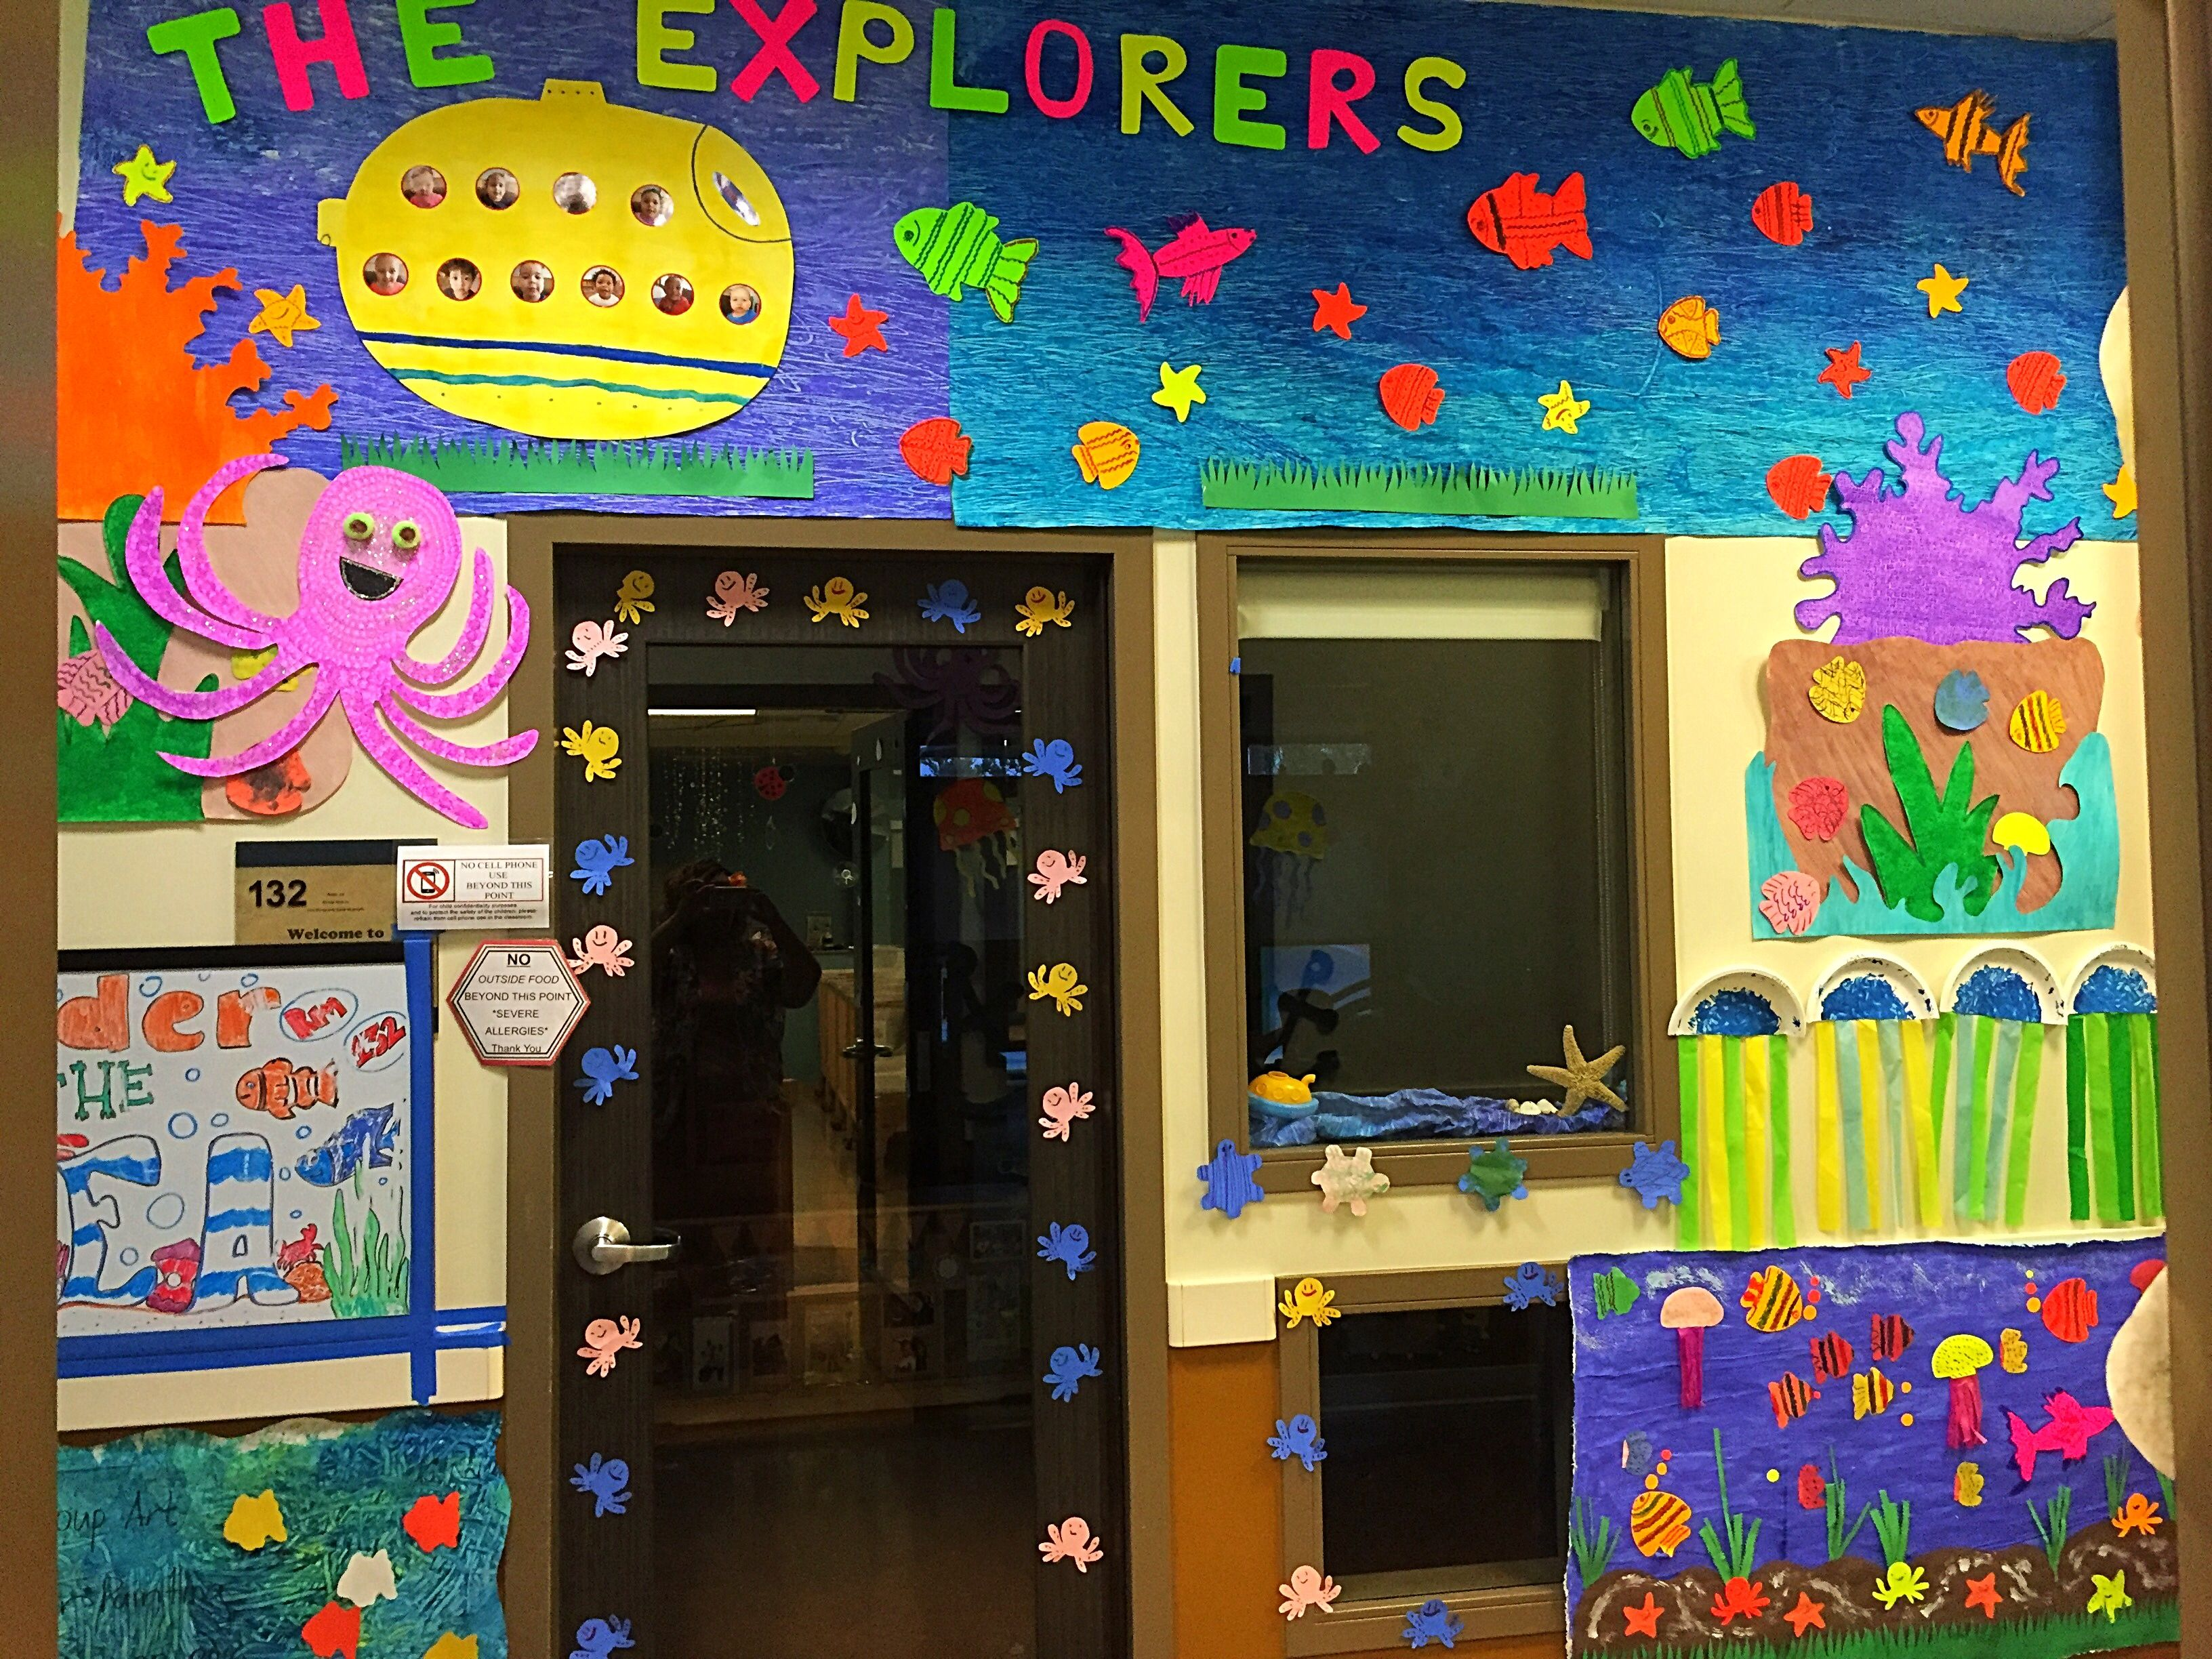 The Explores Pwcdc S Under The Sea Door Decoration Contest